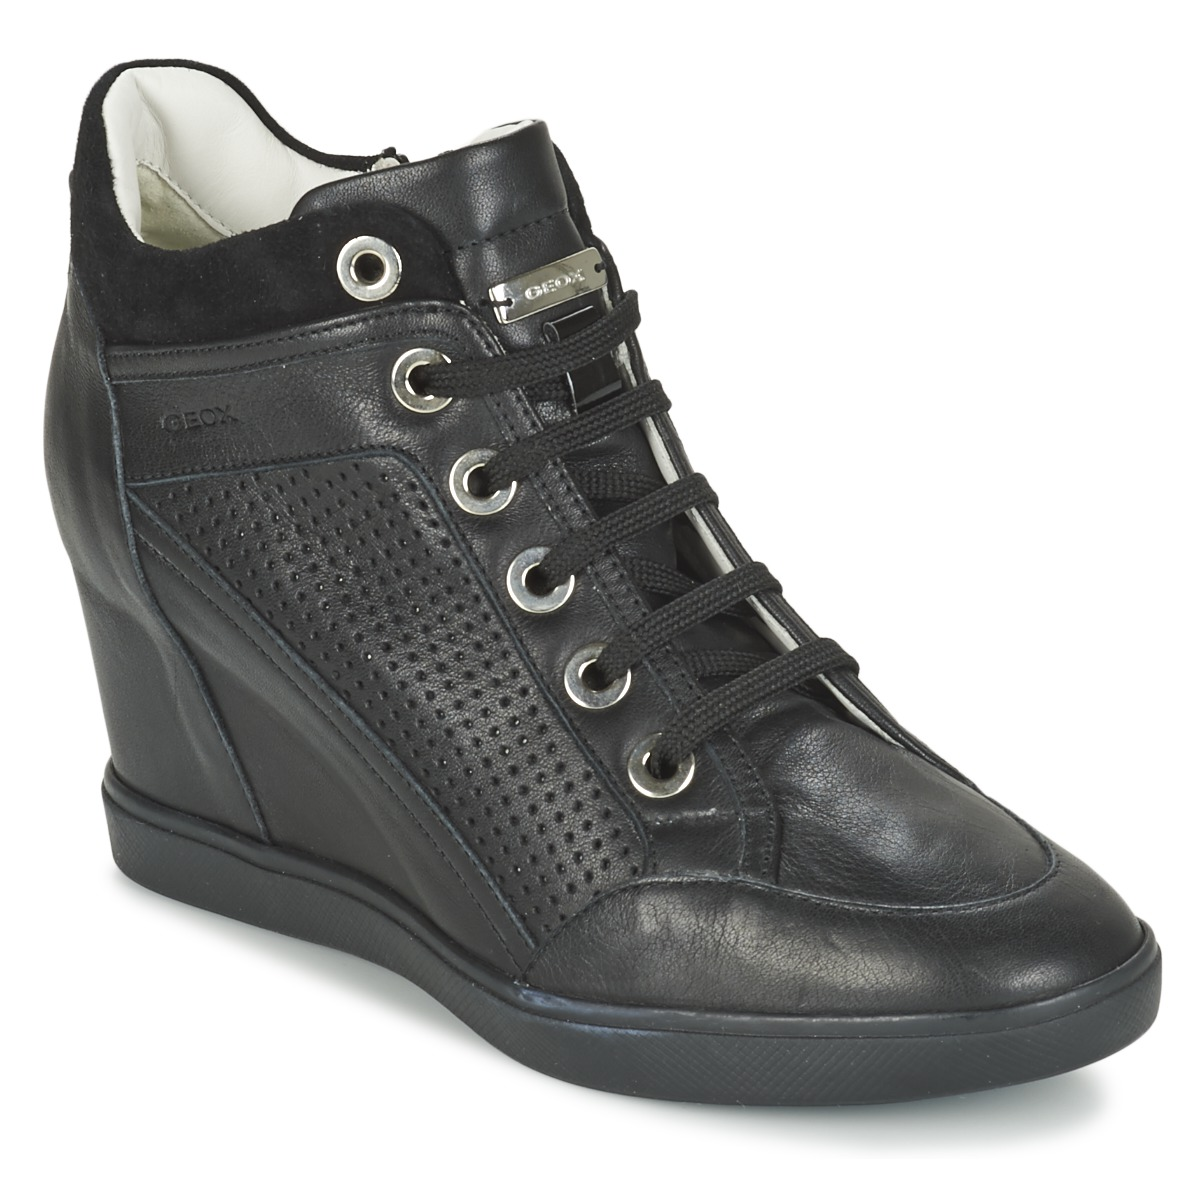 49cf28a80b1 Ψηλά Sneakers Geox ELENI C, Γυναικεία sneakers, ΓΥΝΑΙΚΑ | ΠΑΠΟΥΤΣΙΑ ...